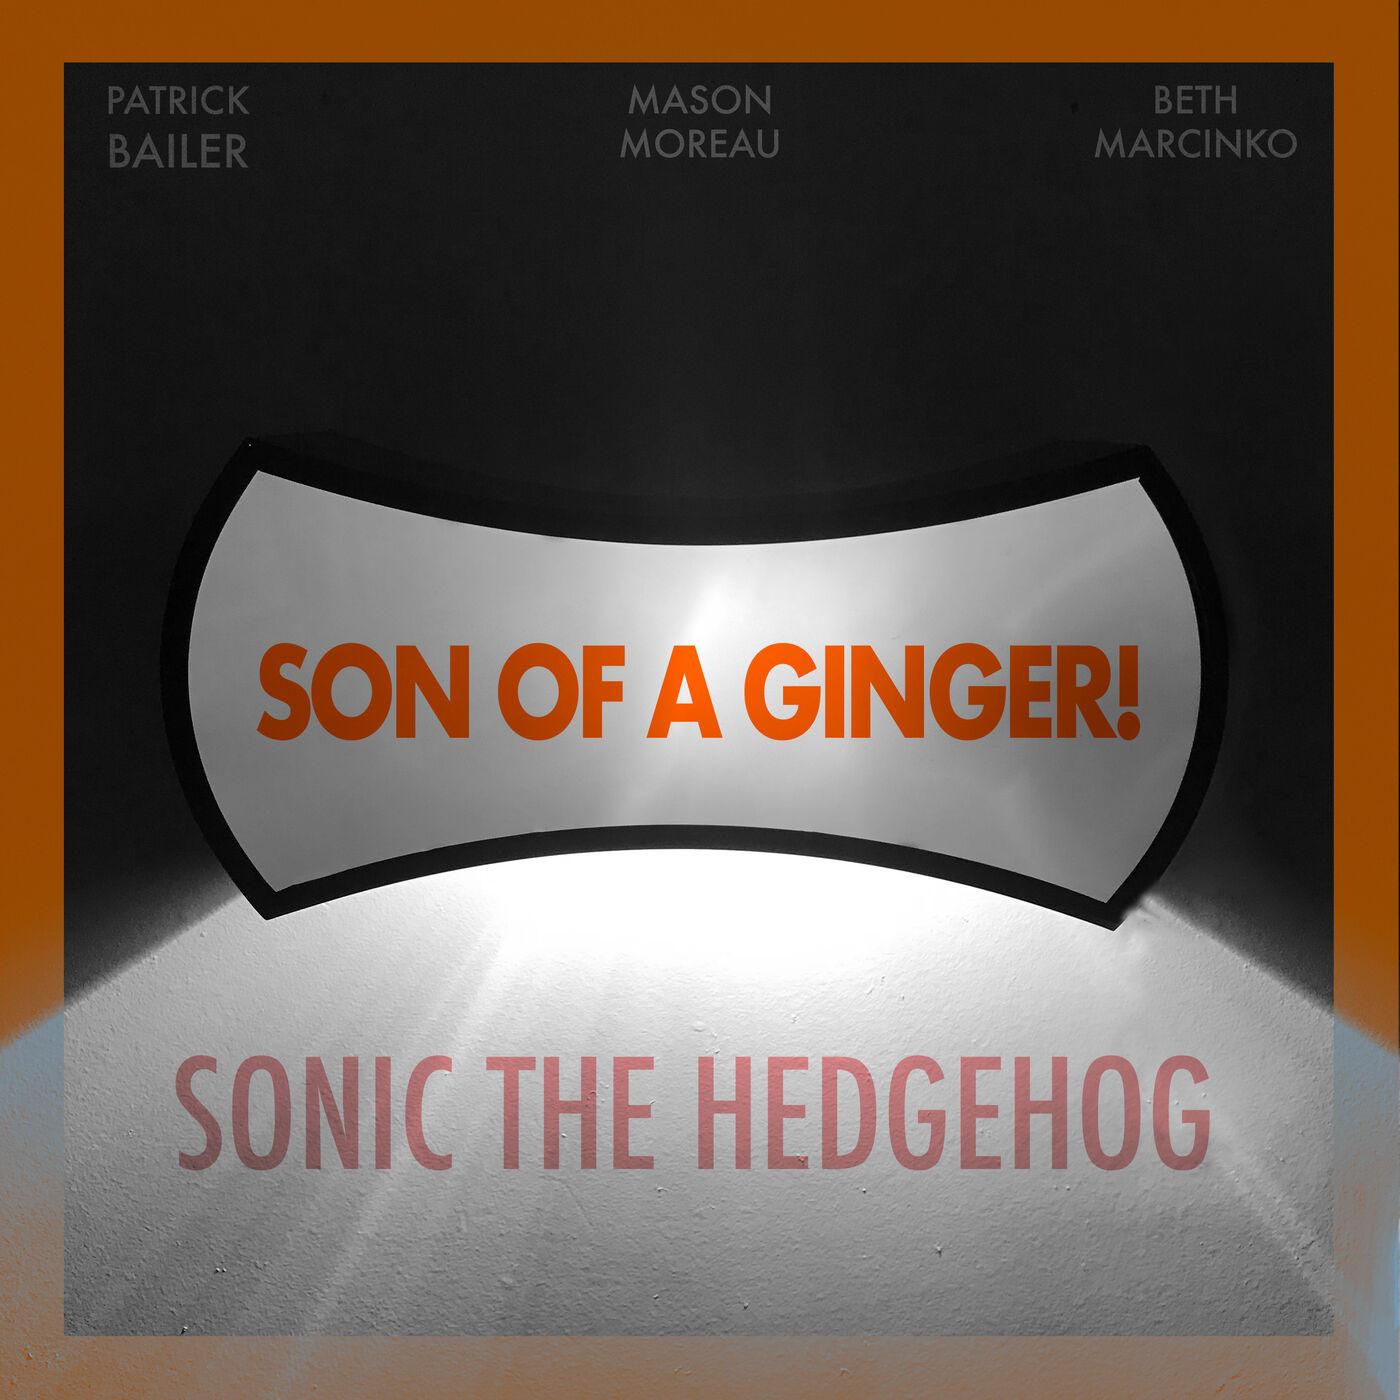 Sonic the Hedgehog (Dir. by Jeff Fowler)